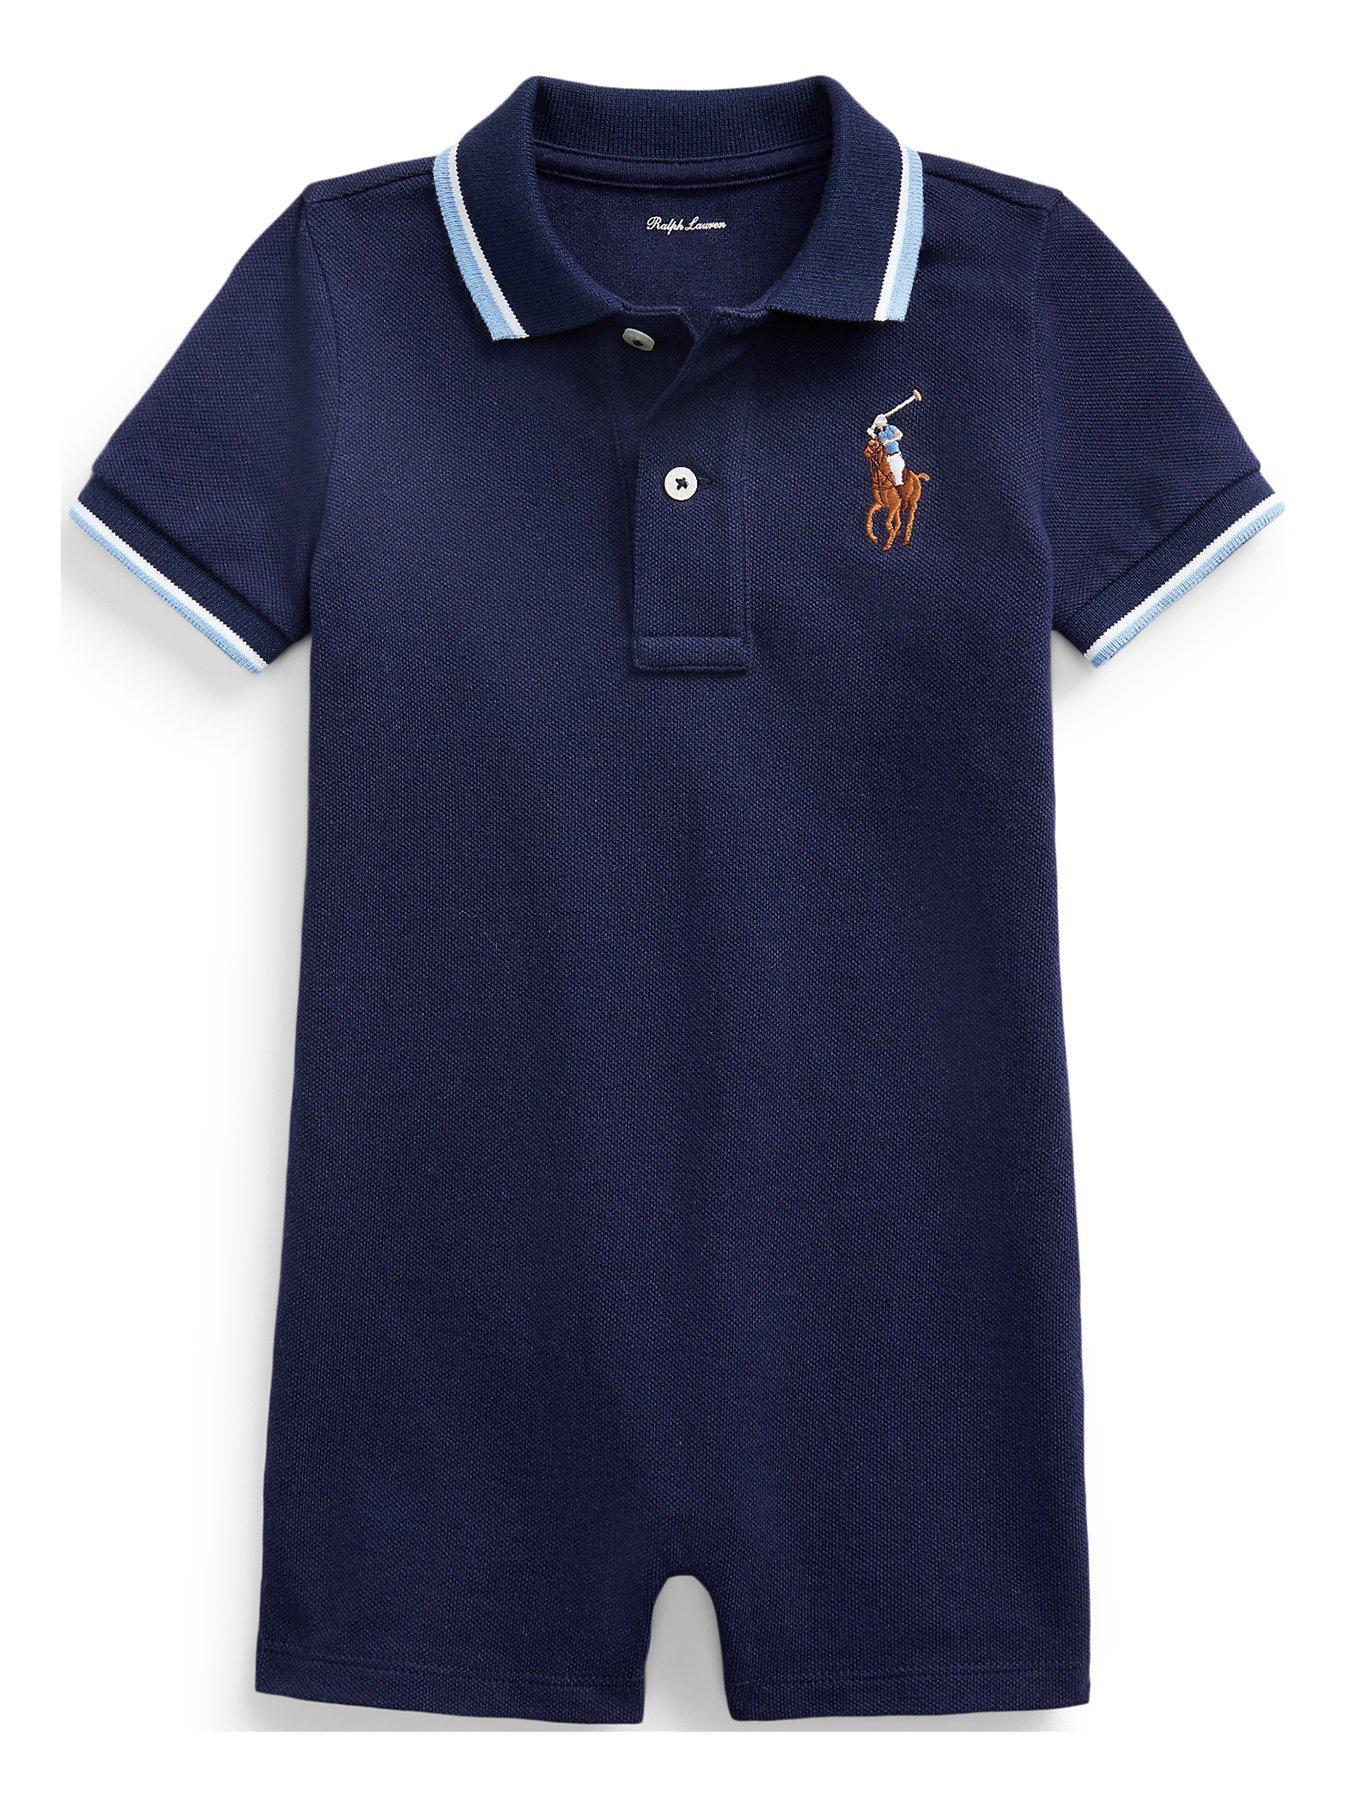 24 months 18 Ralph Lauren baby Boys/' Short Sleeve Cotton Polo Shirt sizes 12